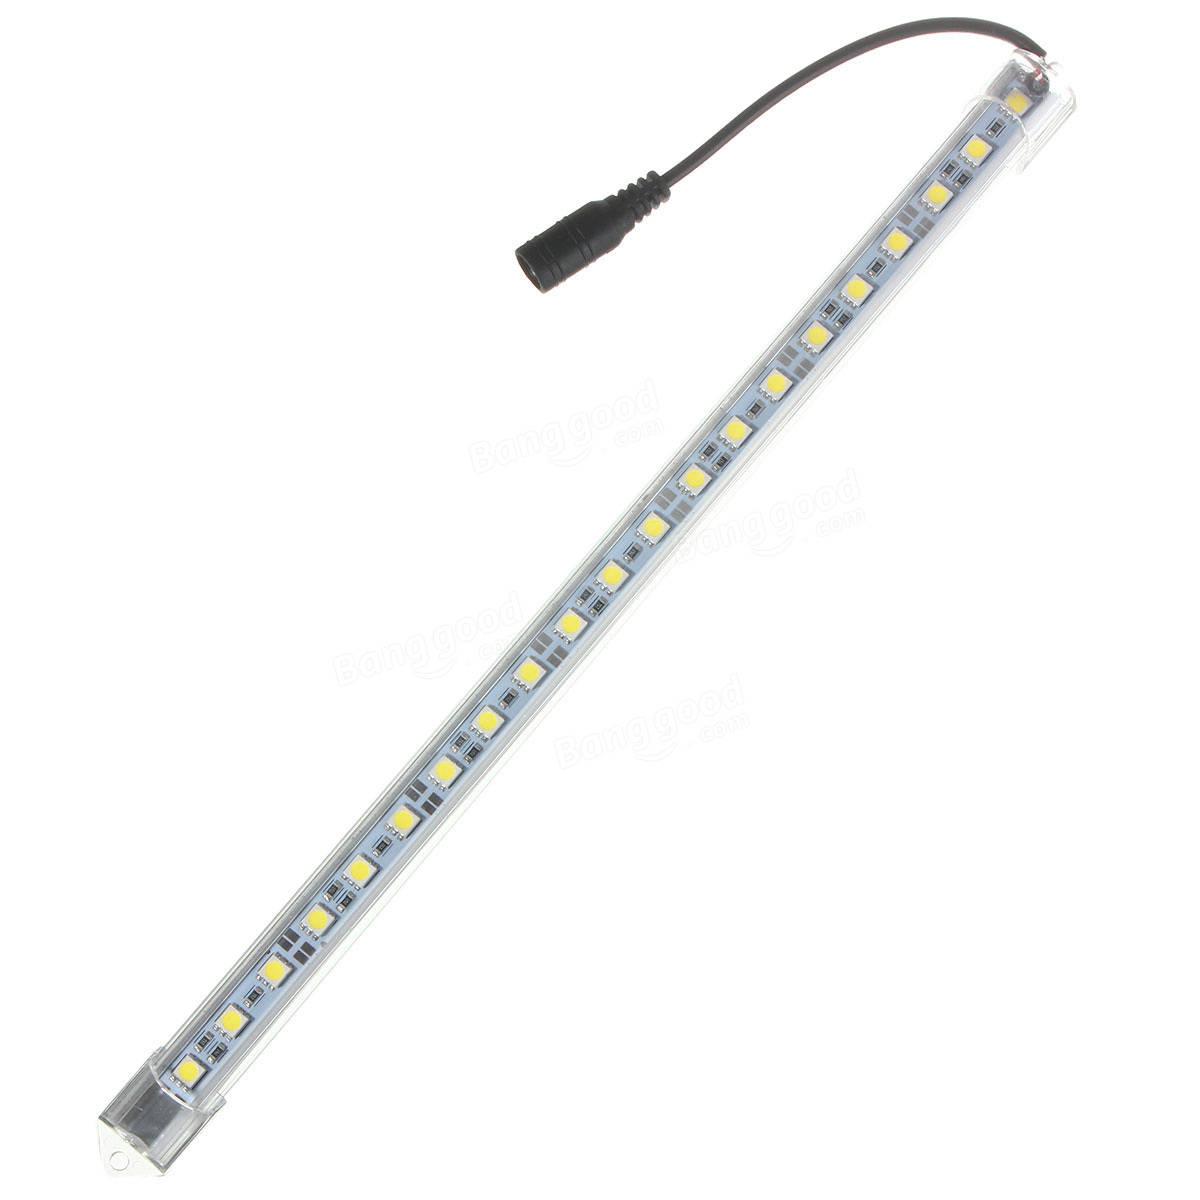 5w 30cm Dc12v 21smd Led Aluminum Alloy Shell Under Cabinet Tube Bar Strip Light Sale